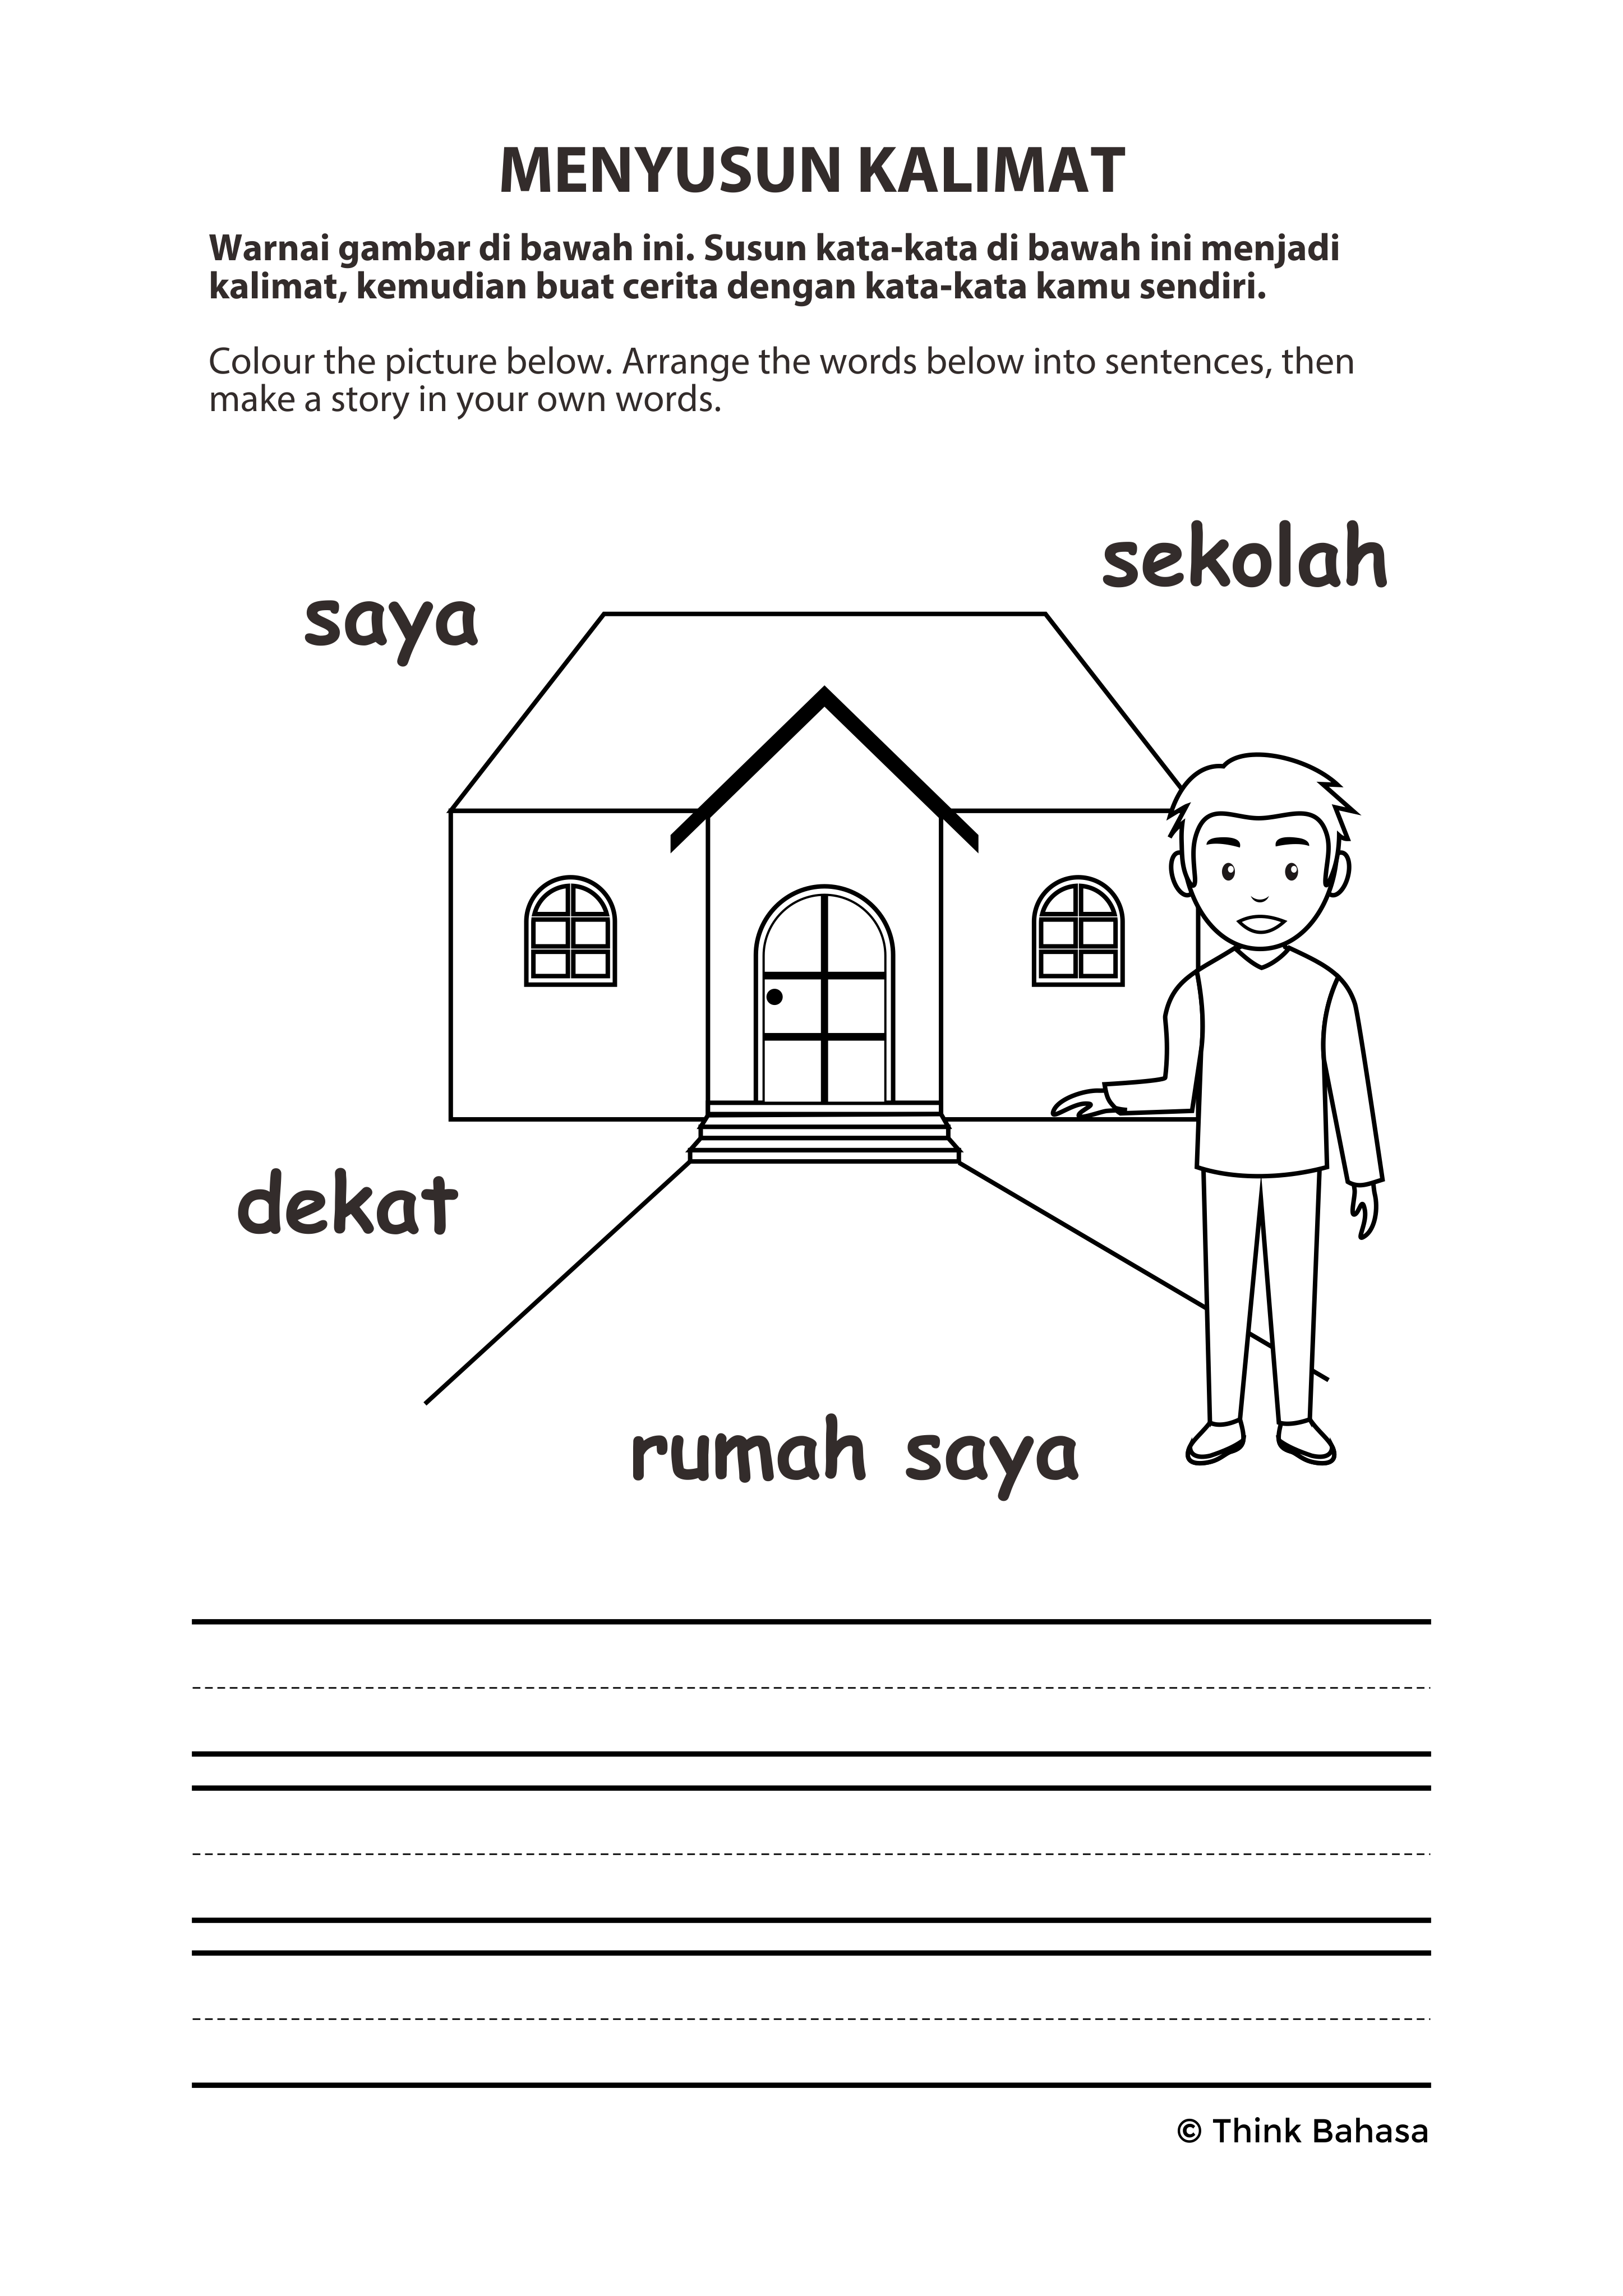 Belajar Bahasa Indonesia Sentence Building Activities Sight Words Sight Word Sentences